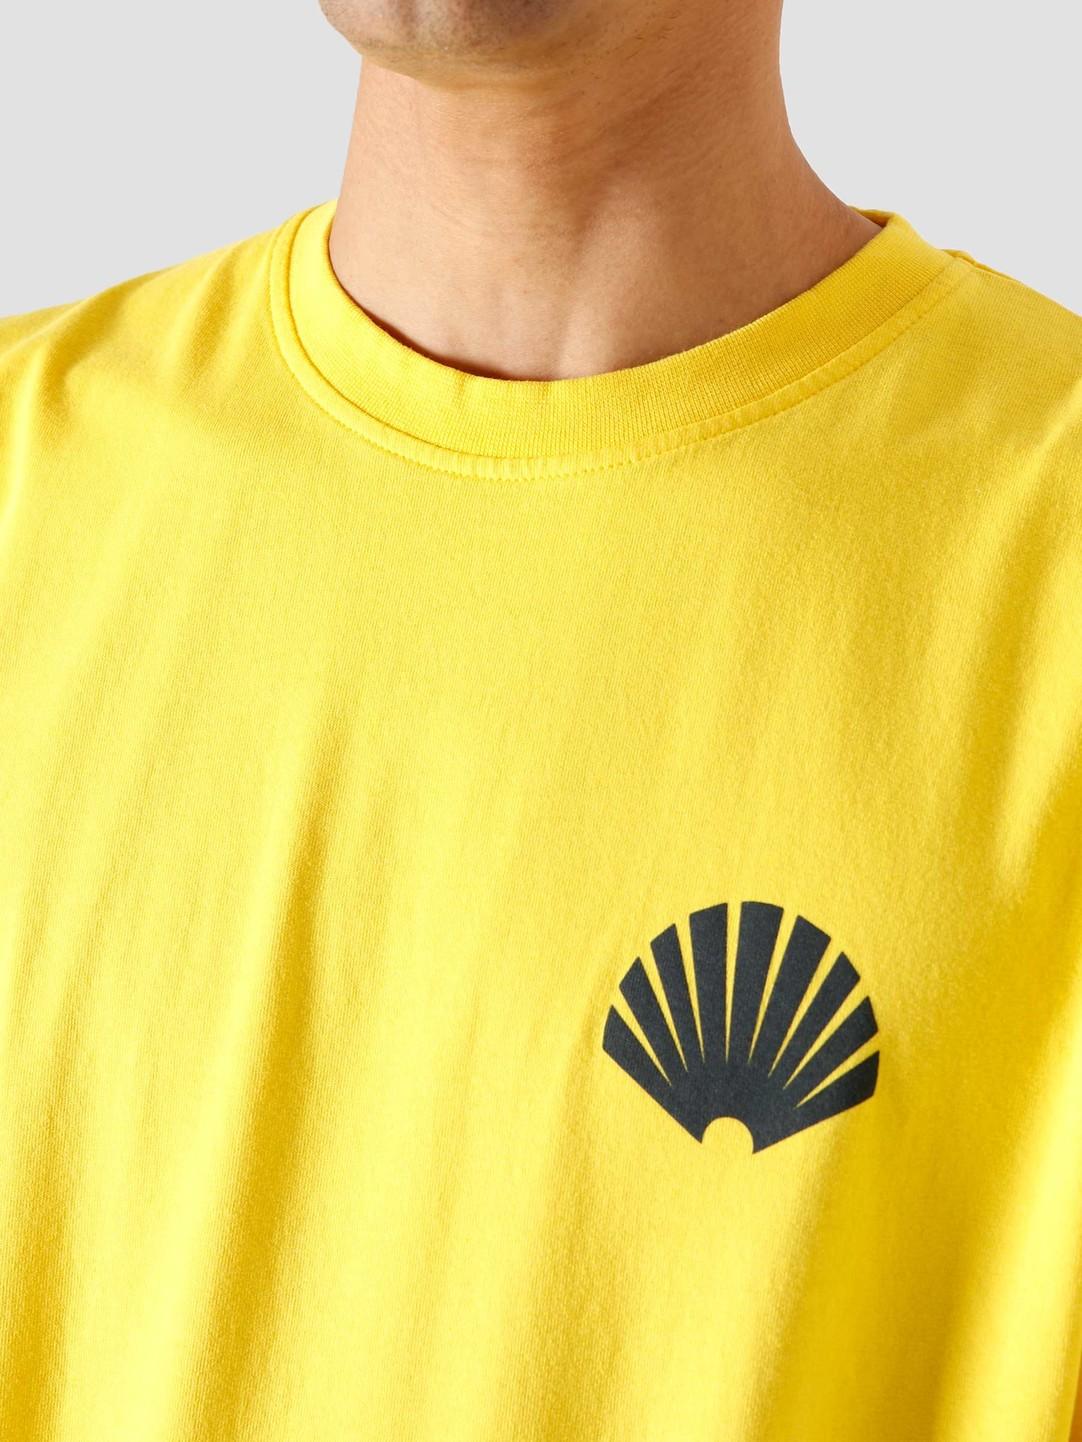 New Amsterdam Surf Association New Amsterdam Surf association Logo Tee Cyber Yellow